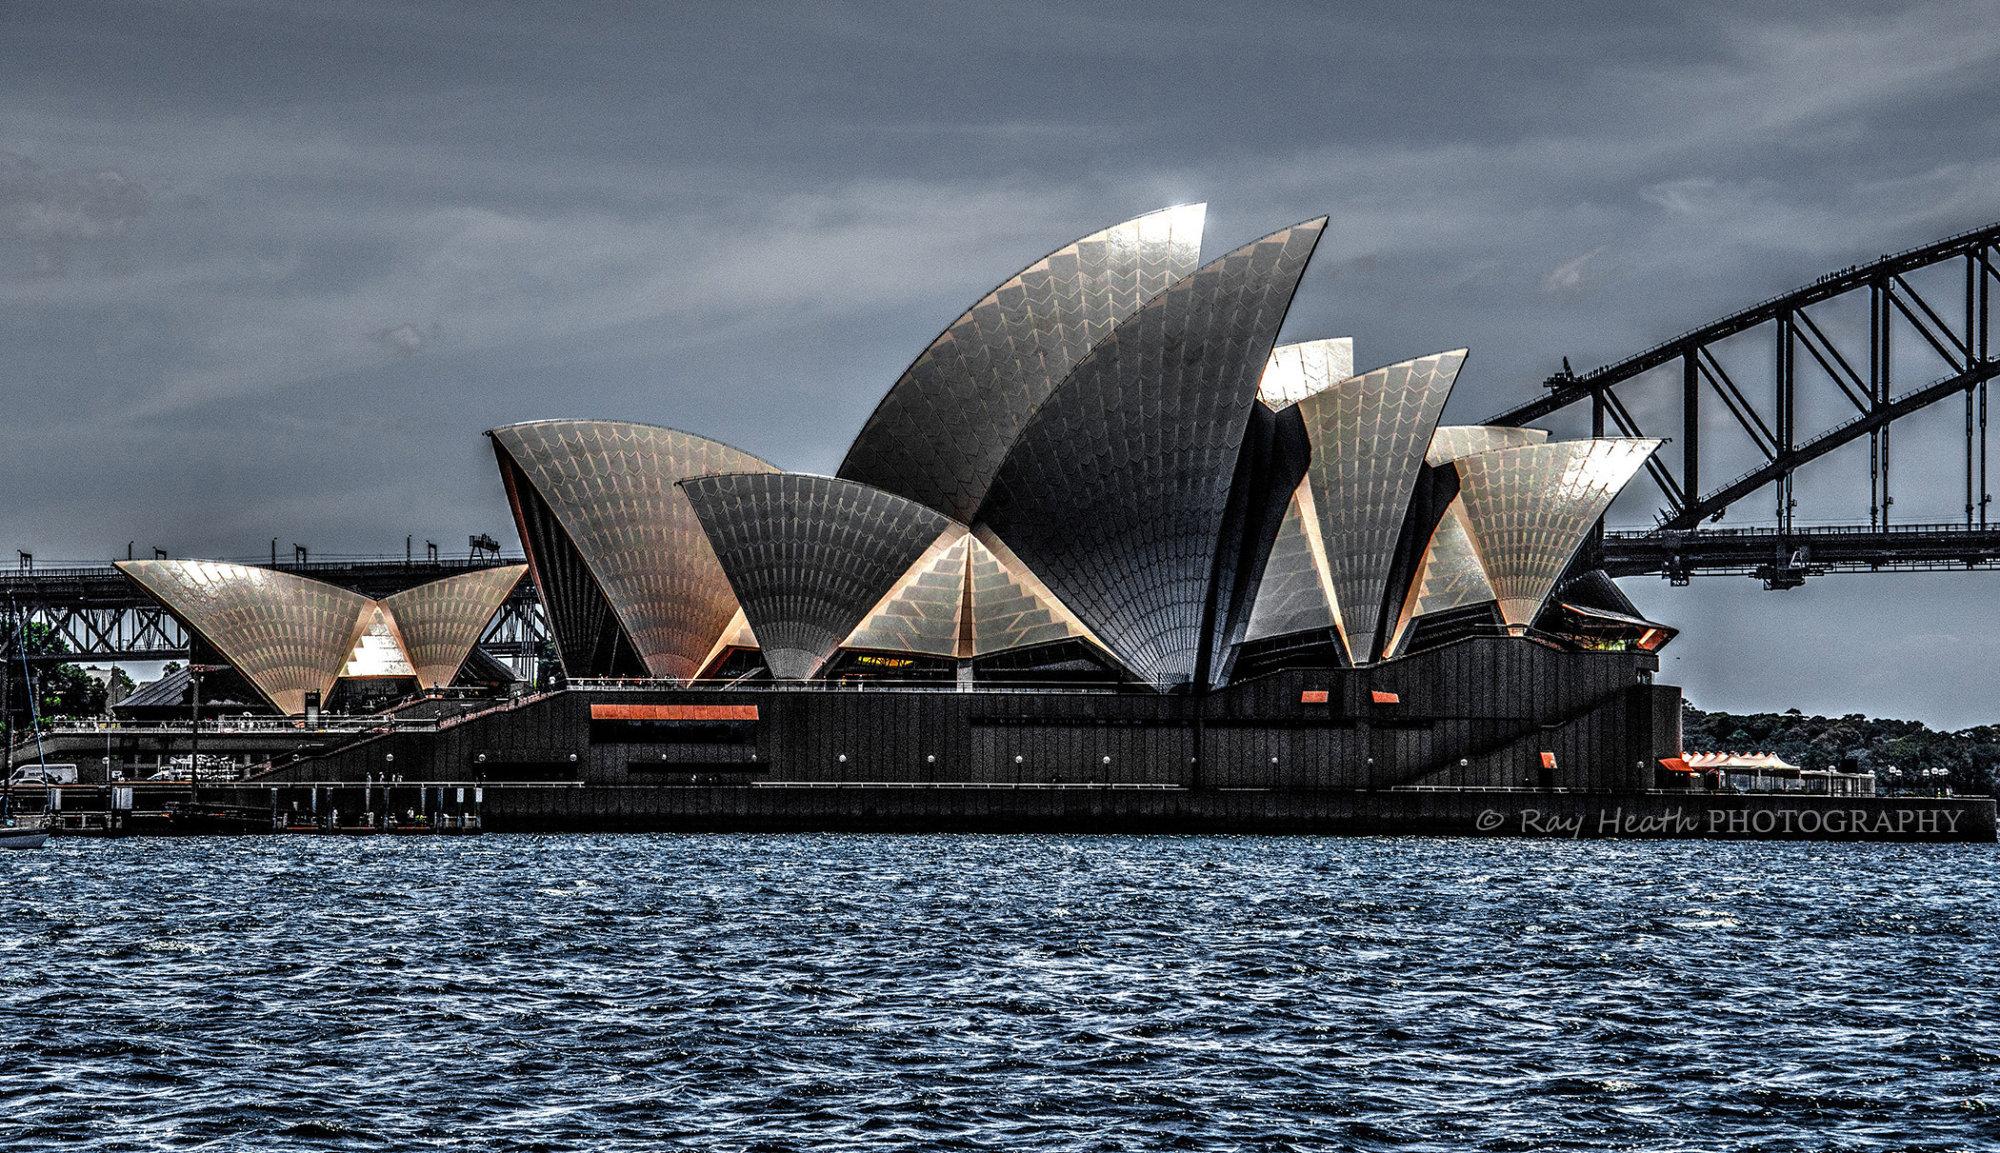 Digital art image 3 of the Sydney Opera House - Australia